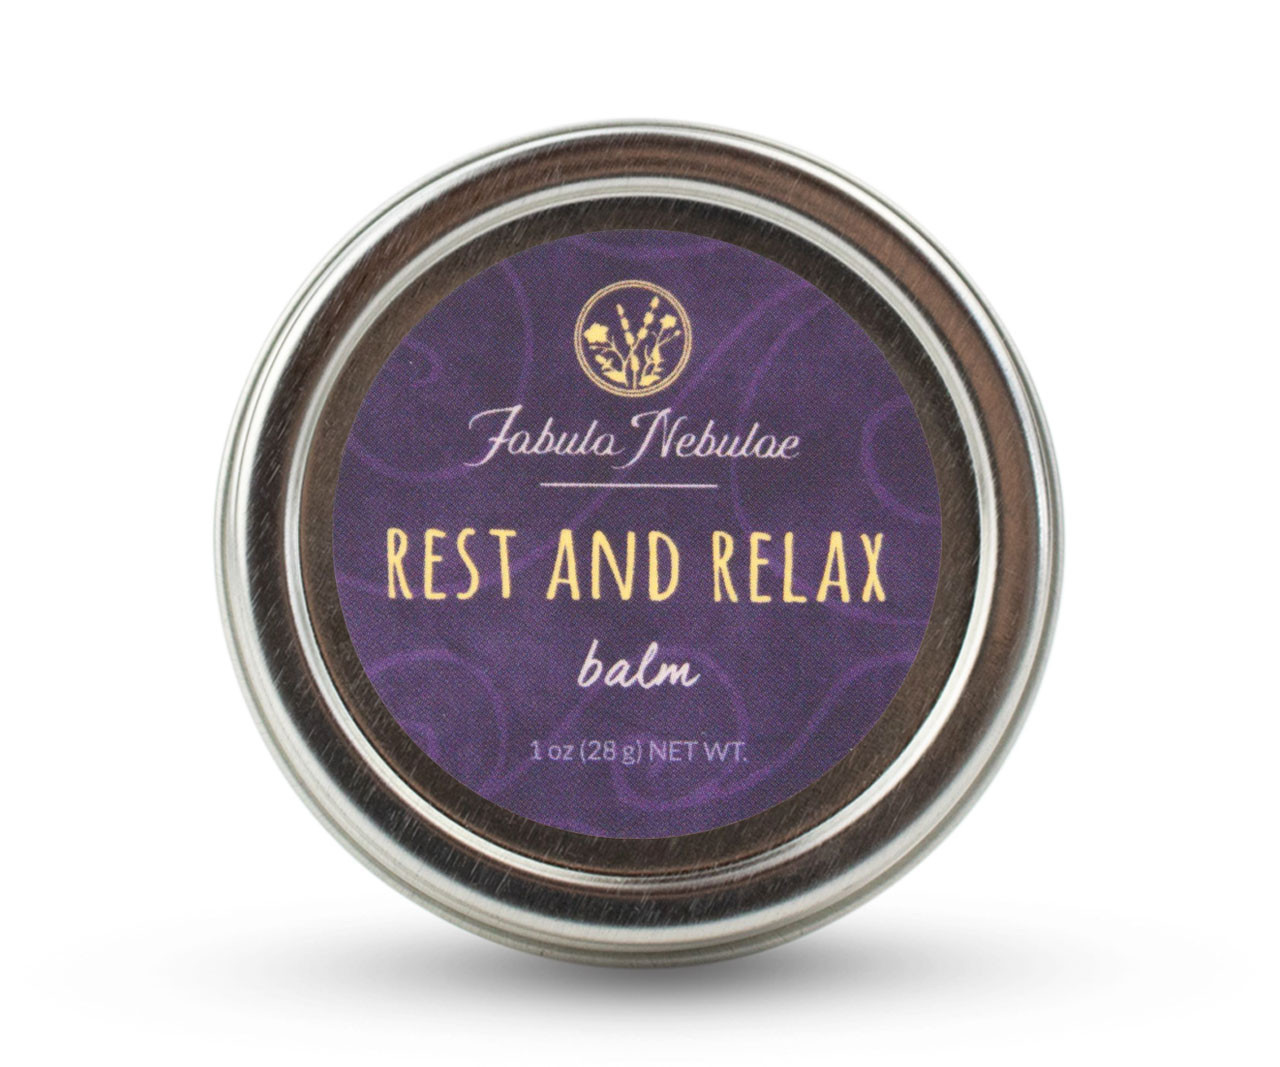 Fabula Nebulae Rest and Relax Balm